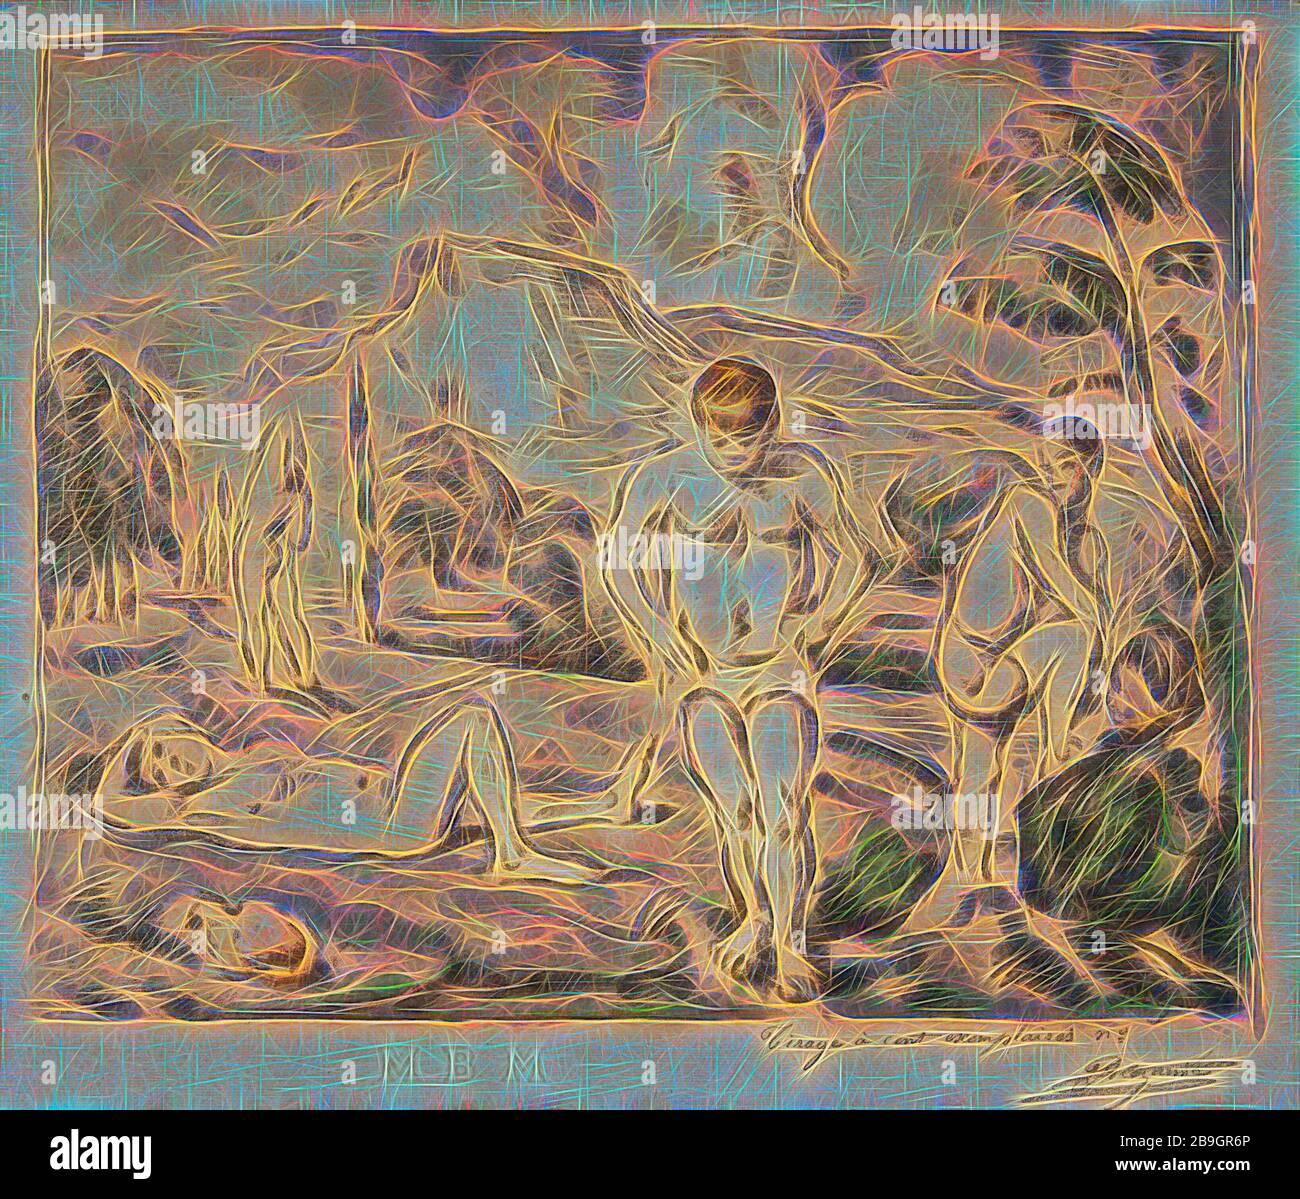 Paul Cézanne, Auguste Clot: Los grandes bañistas, Paul Cézanne, Auguste Clot, probablemente 1898, Litografía impresa en múltiples colores sobre papel colocado, total: 19 1/8 x 25 pulg. (48.6 x 63.5 cm) Foto de stock